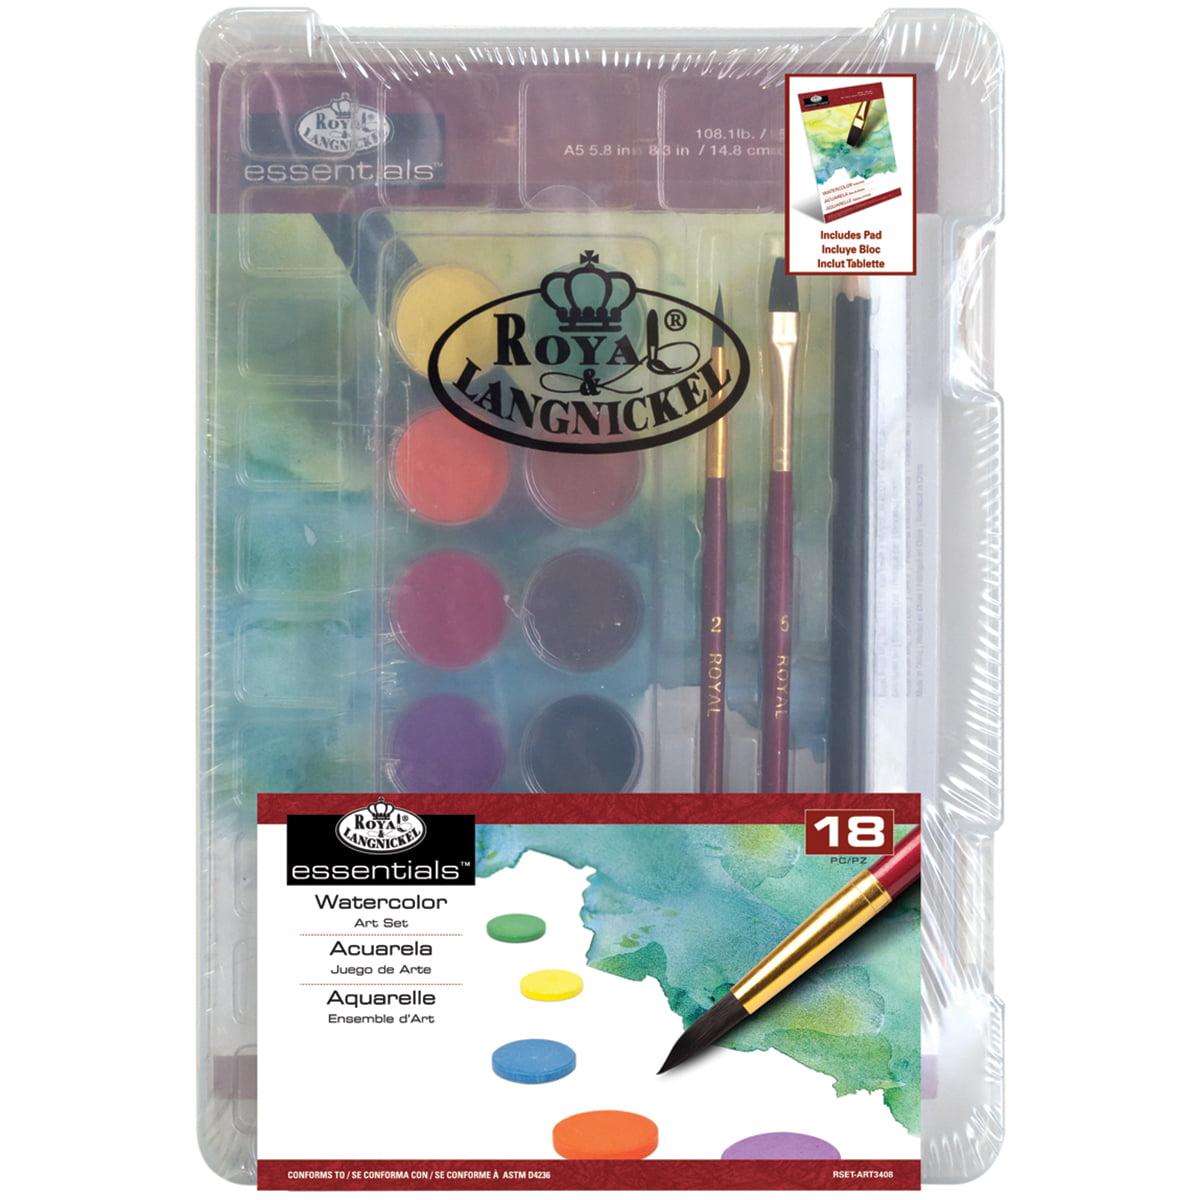 Clearview Mini Art Set, Watercolor Art, 18pc